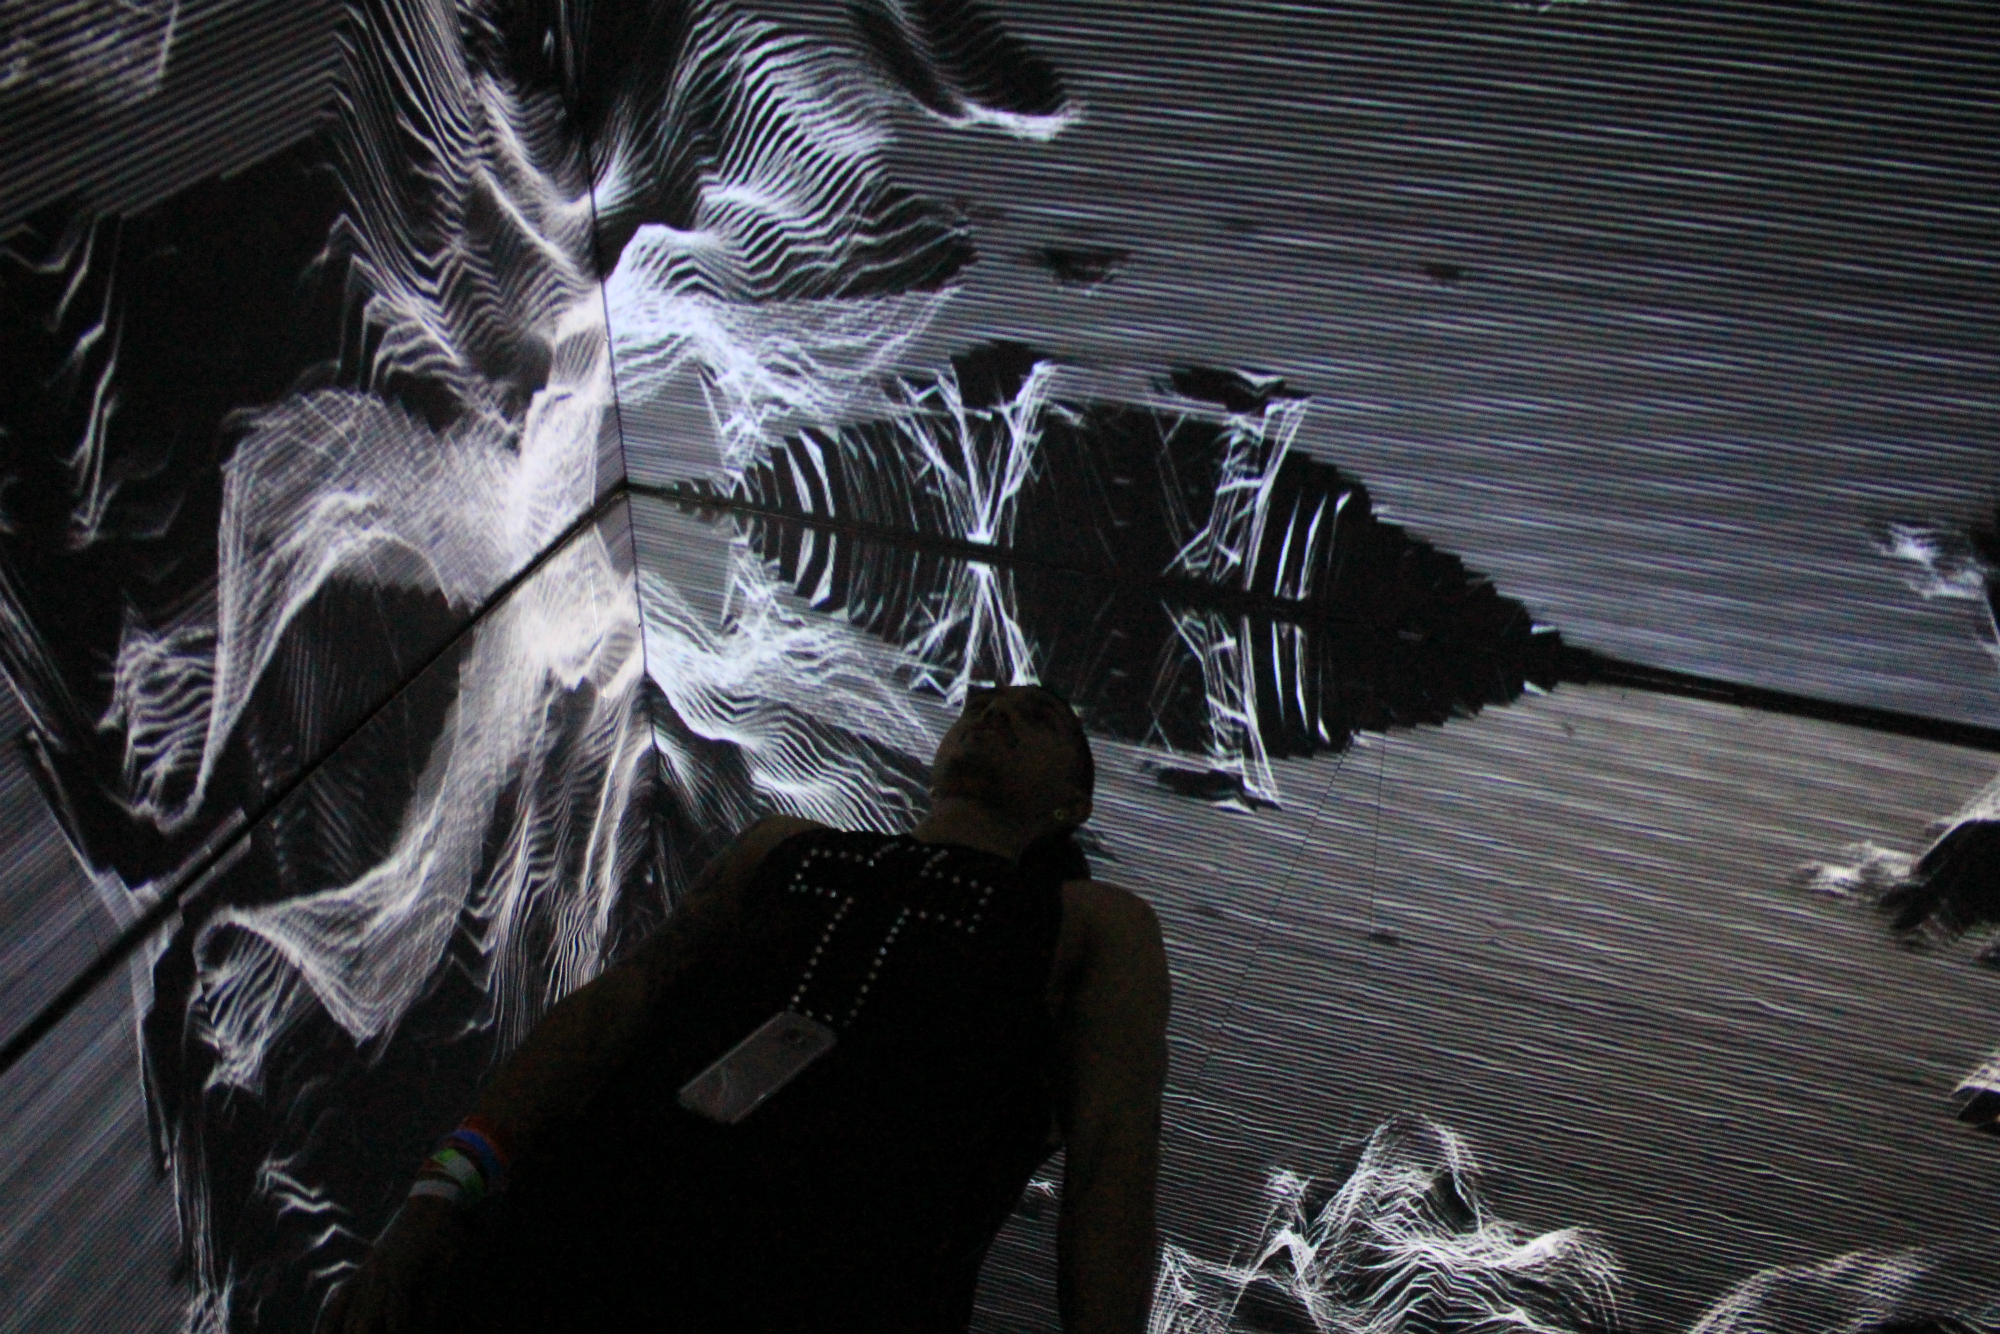 Infinity Room // Photo by Heather Kaplan